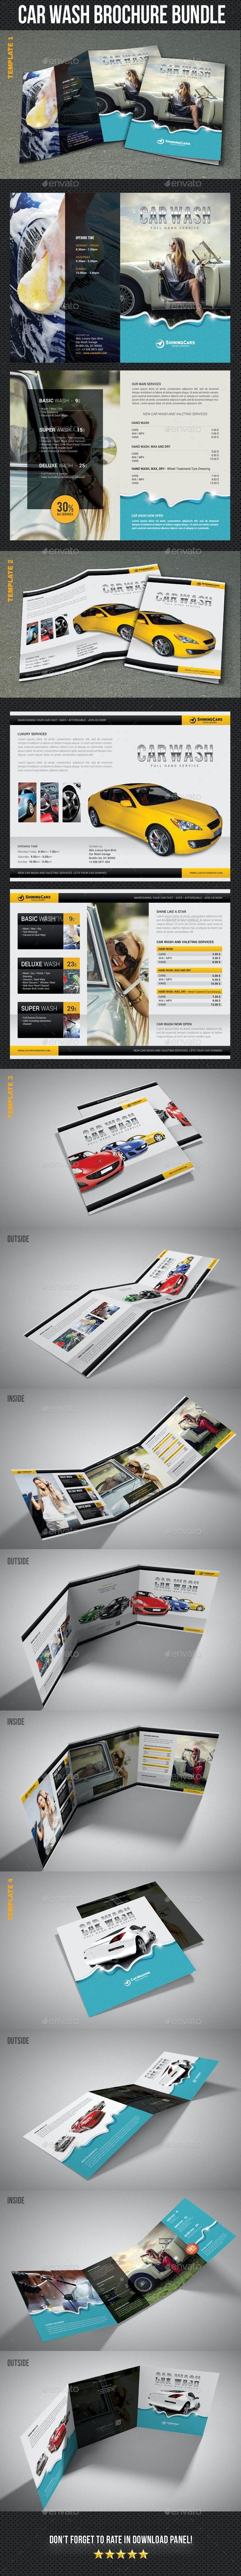 Car Wash Brochure Bundle - Corporate Brochures